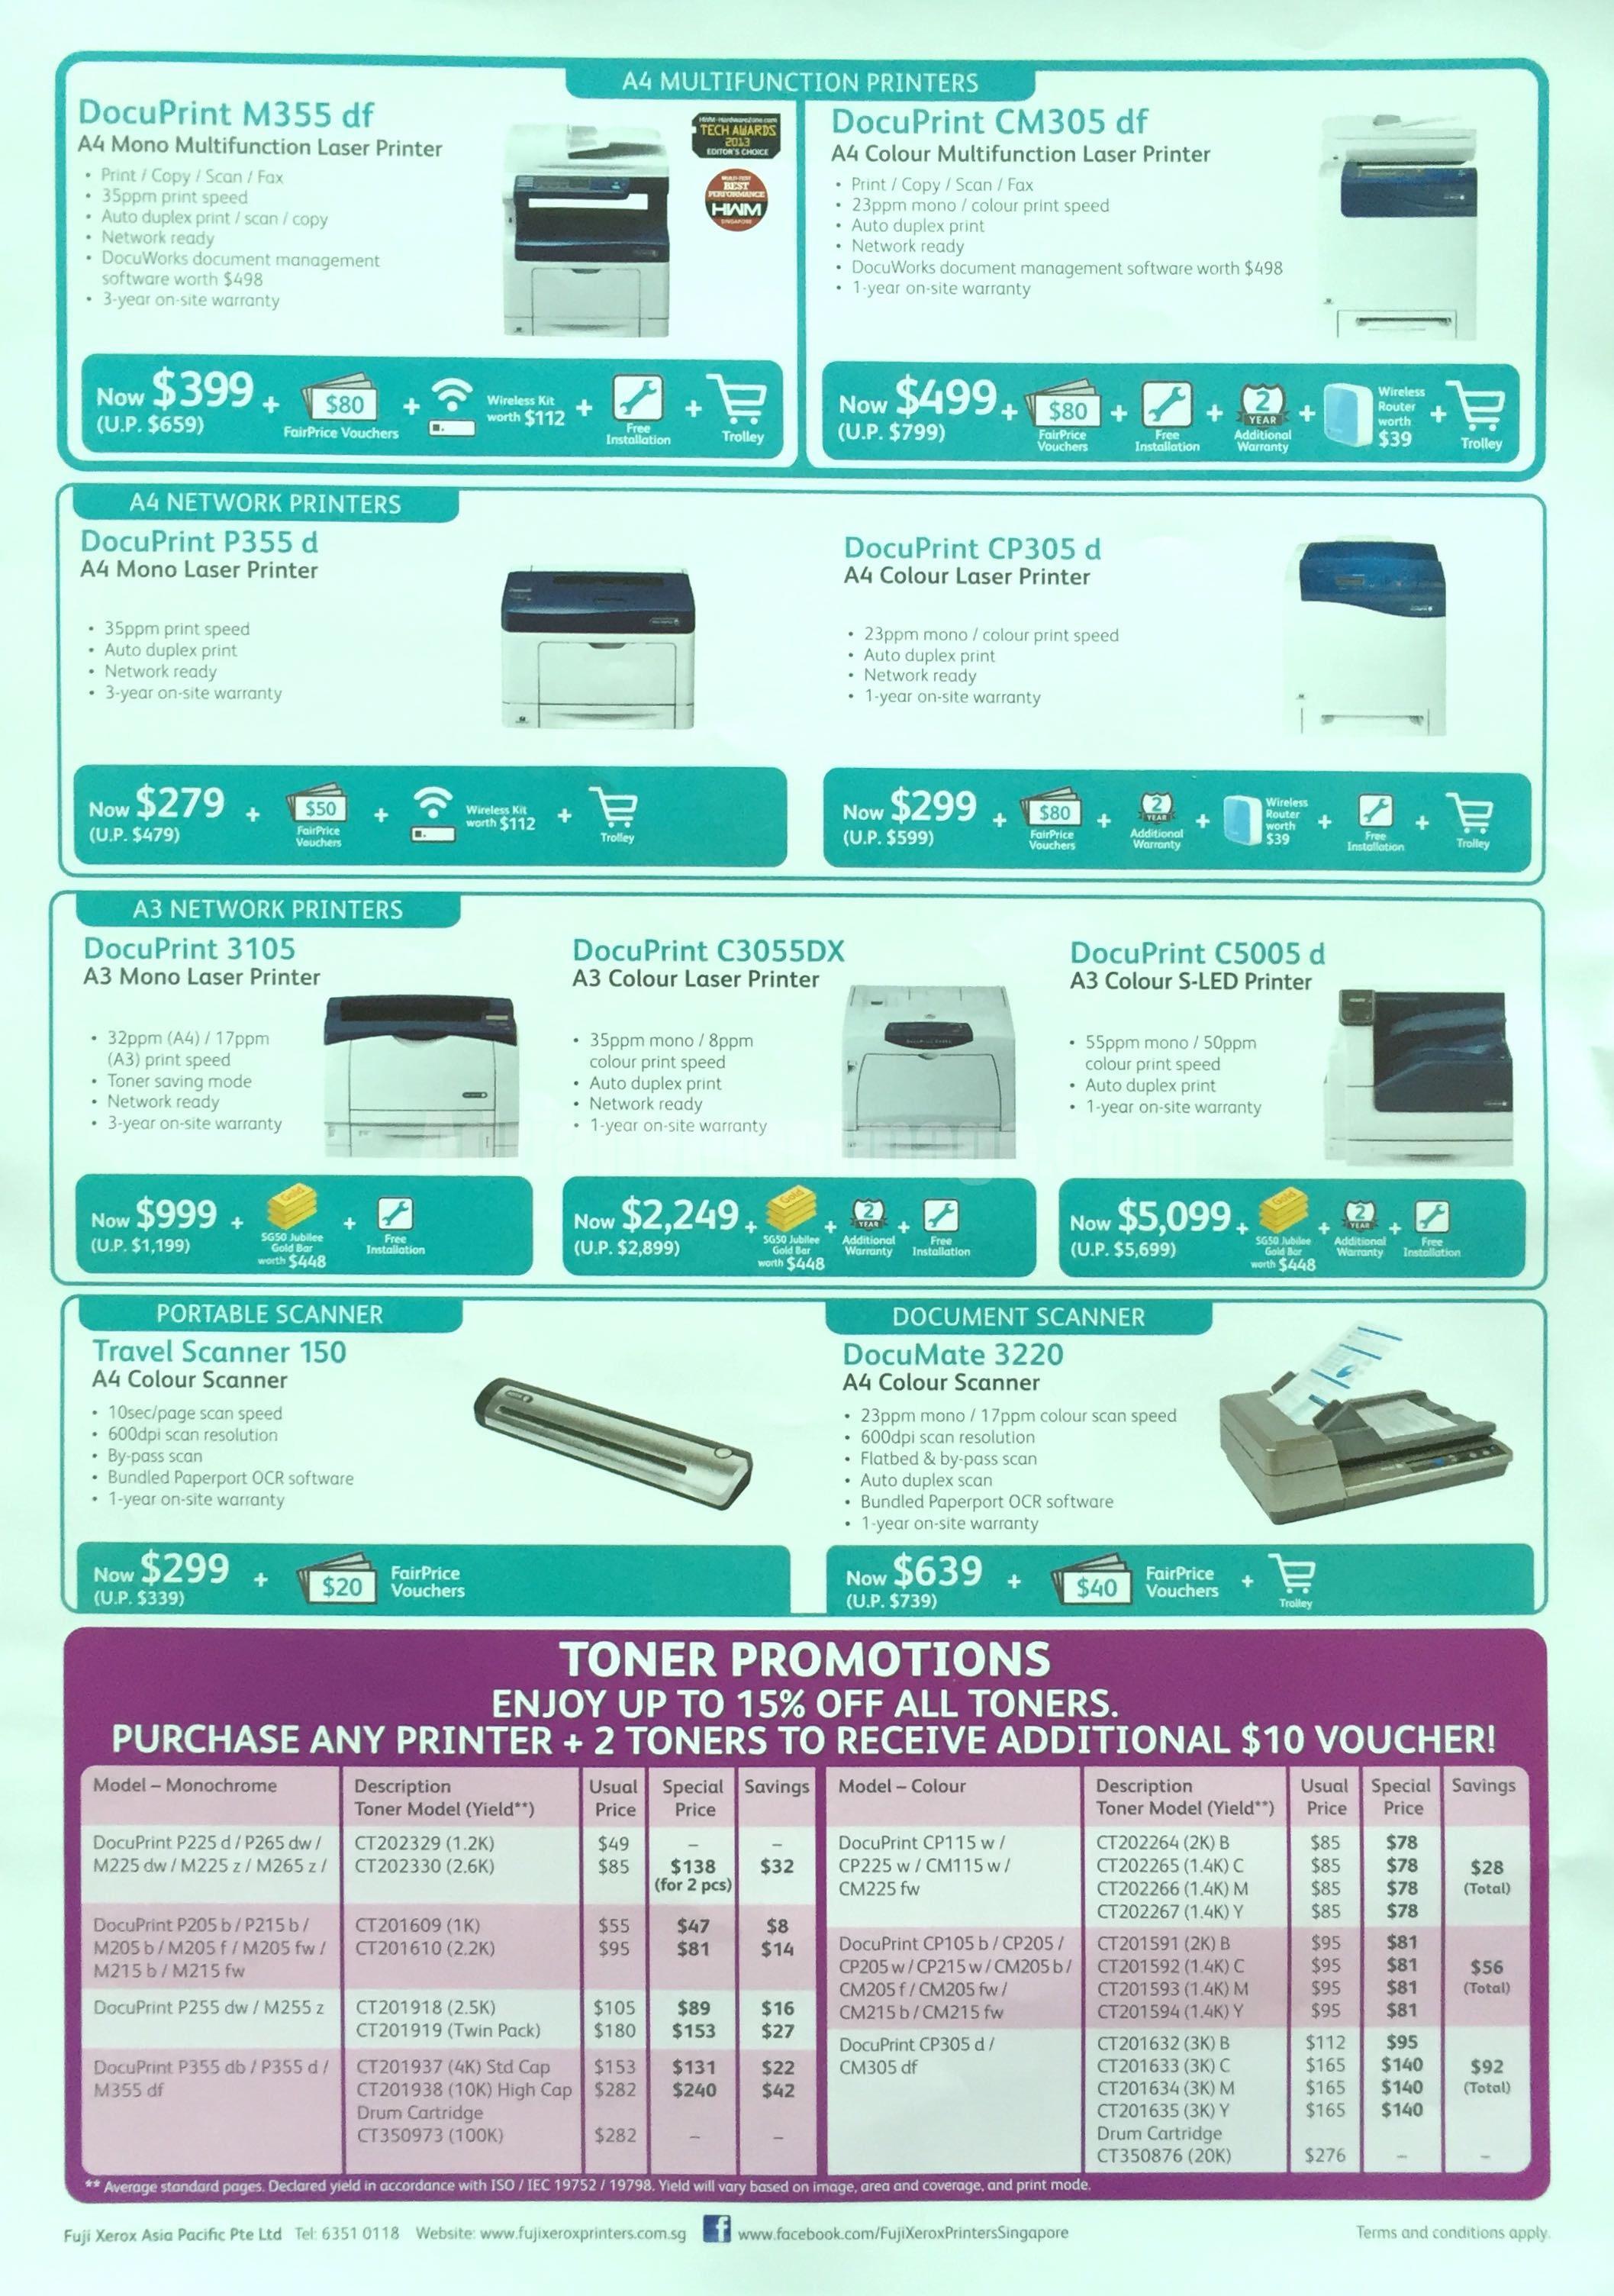 Fuji Xerox @ SITEX 2015 - Printers